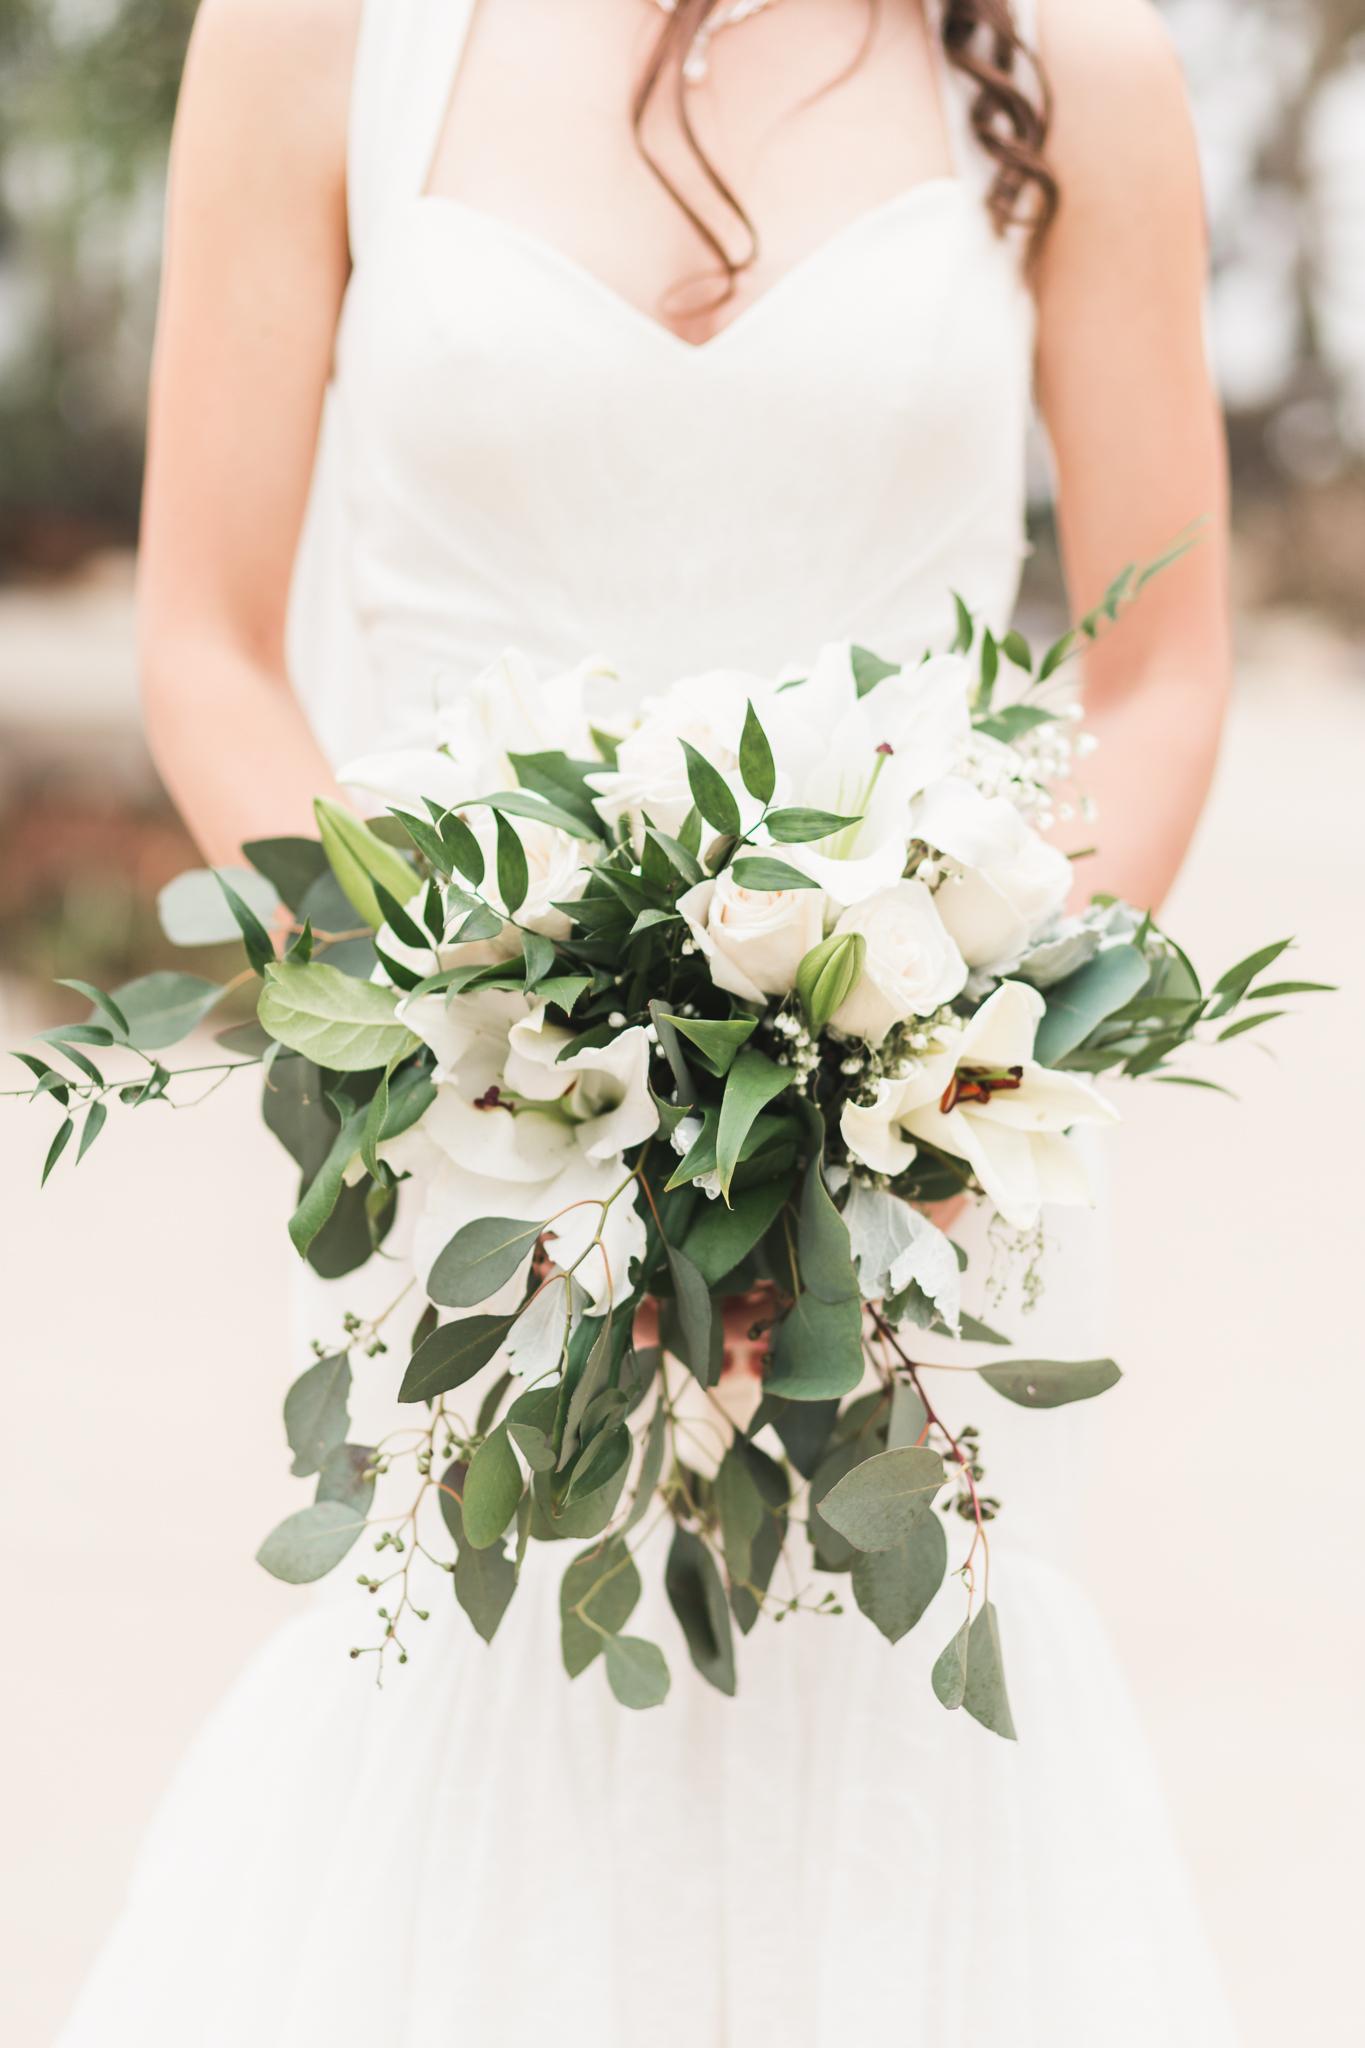 A Rustic DIY Wisconsin Wedding - Heritage Hill State Historical Park Wedding - The Overwhelmed Bride Wedding Blog